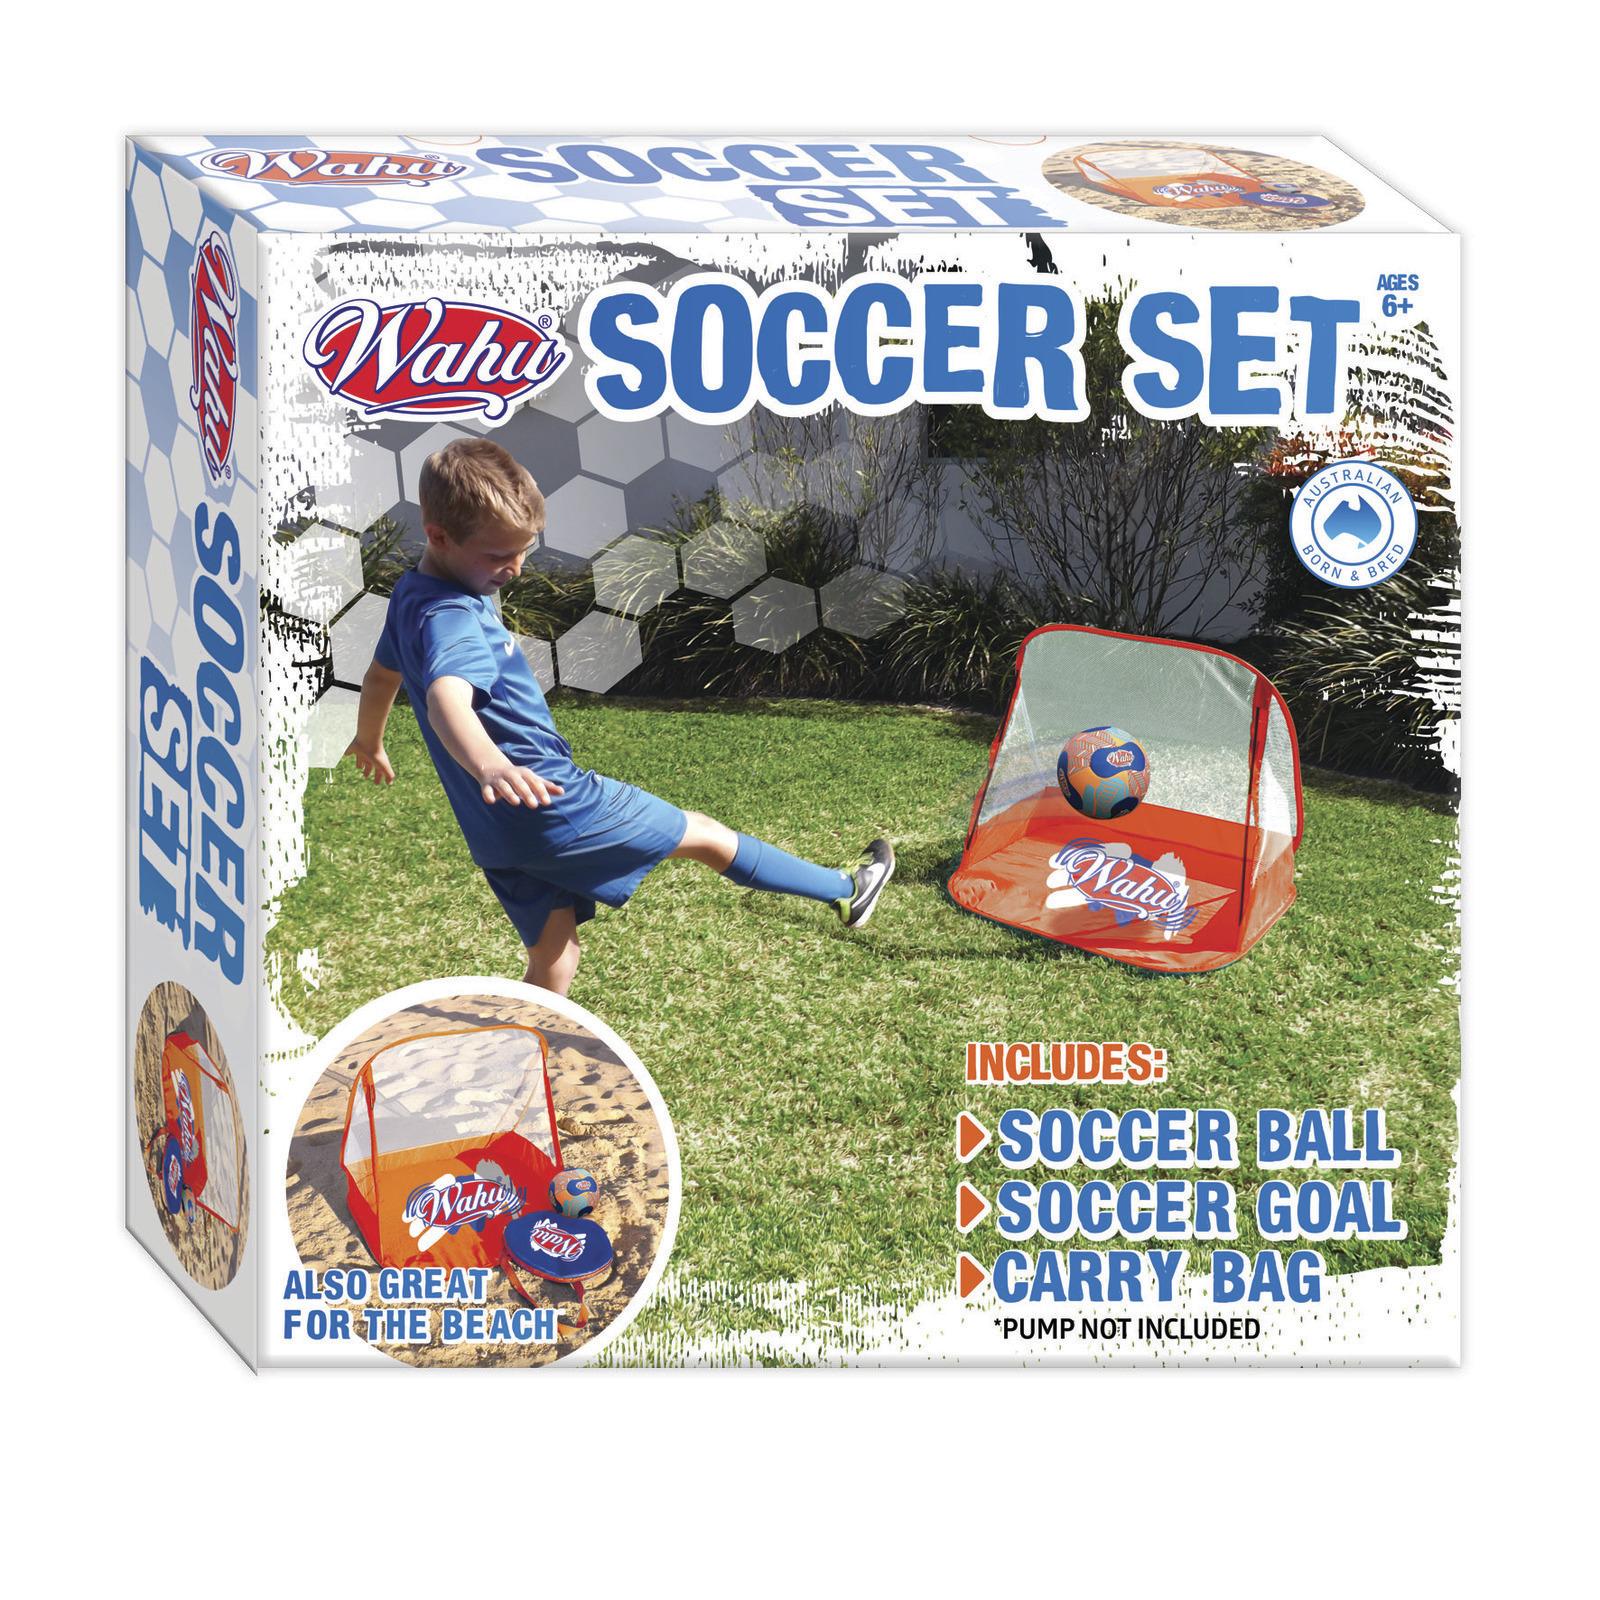 Wahu: Soccer Goal - Beach Playset image